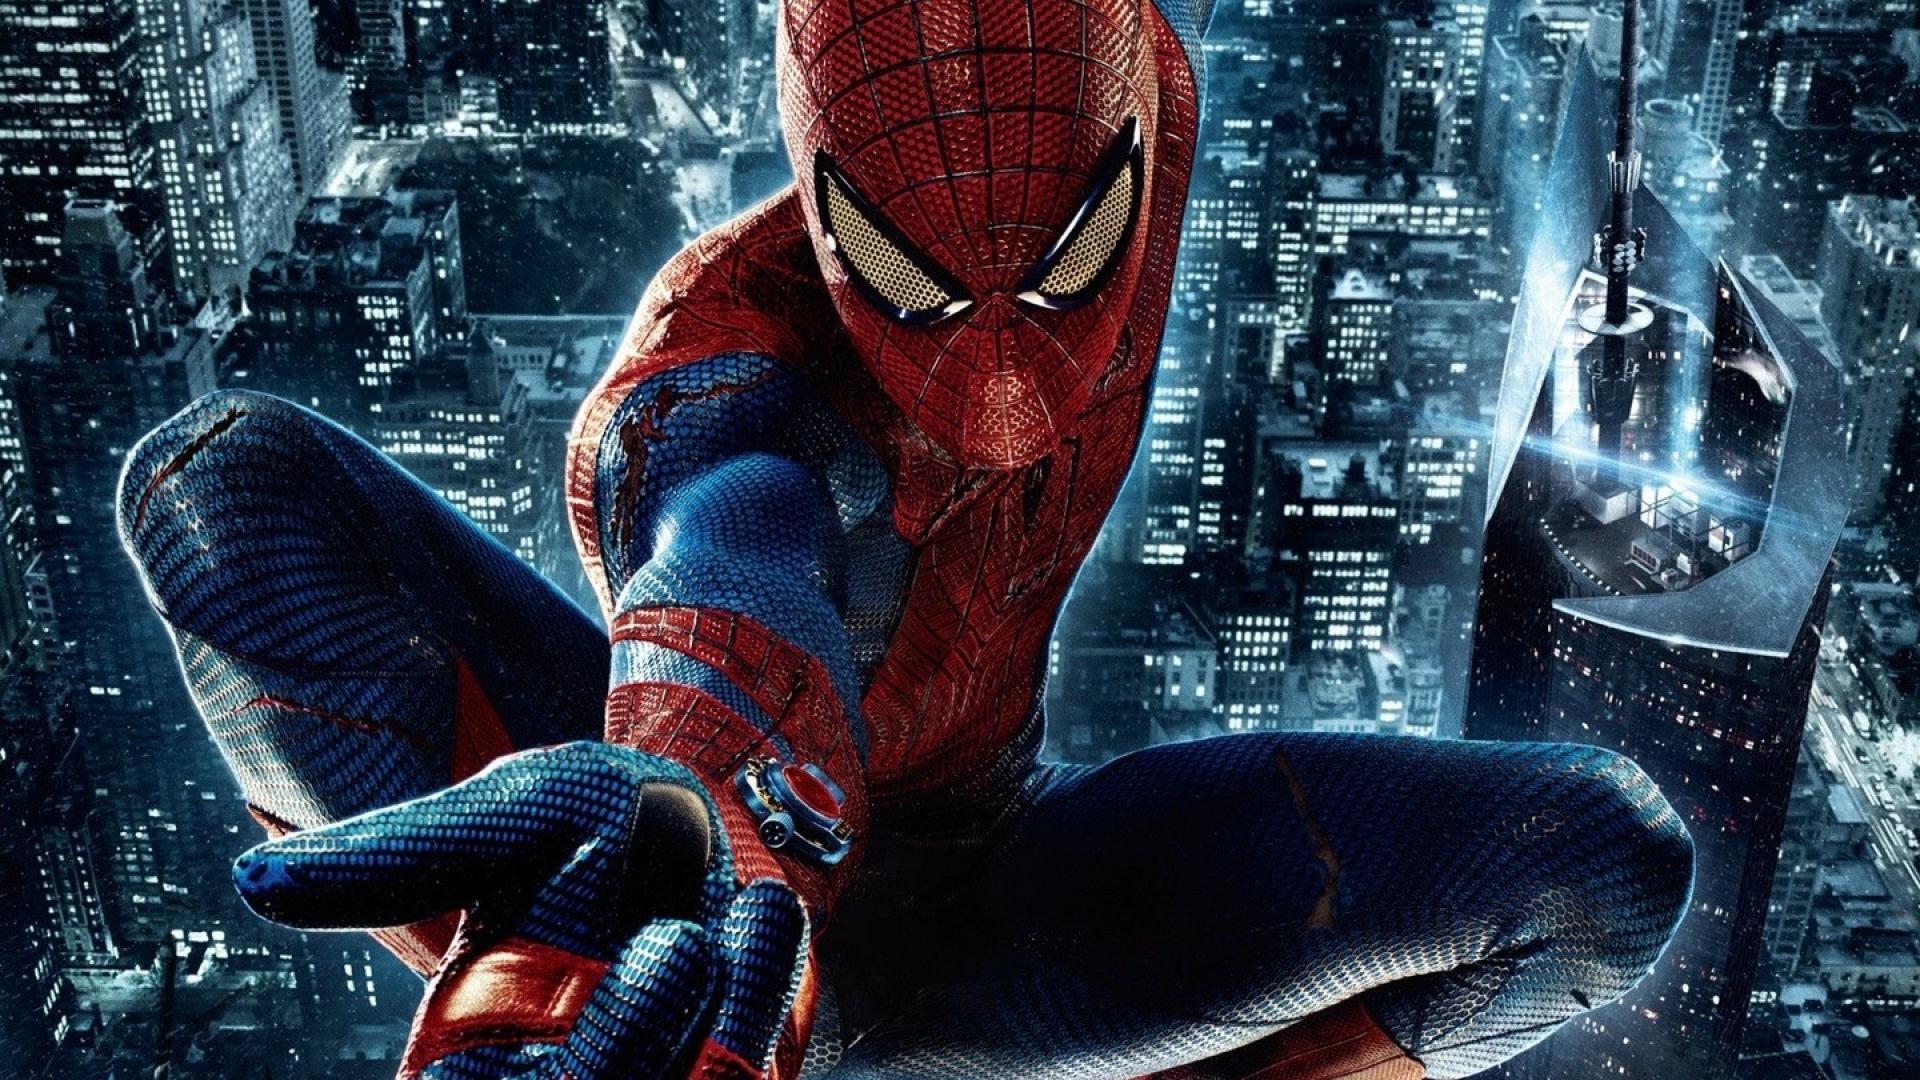 1920x1080 Comics Spider Man Superhero hình nền